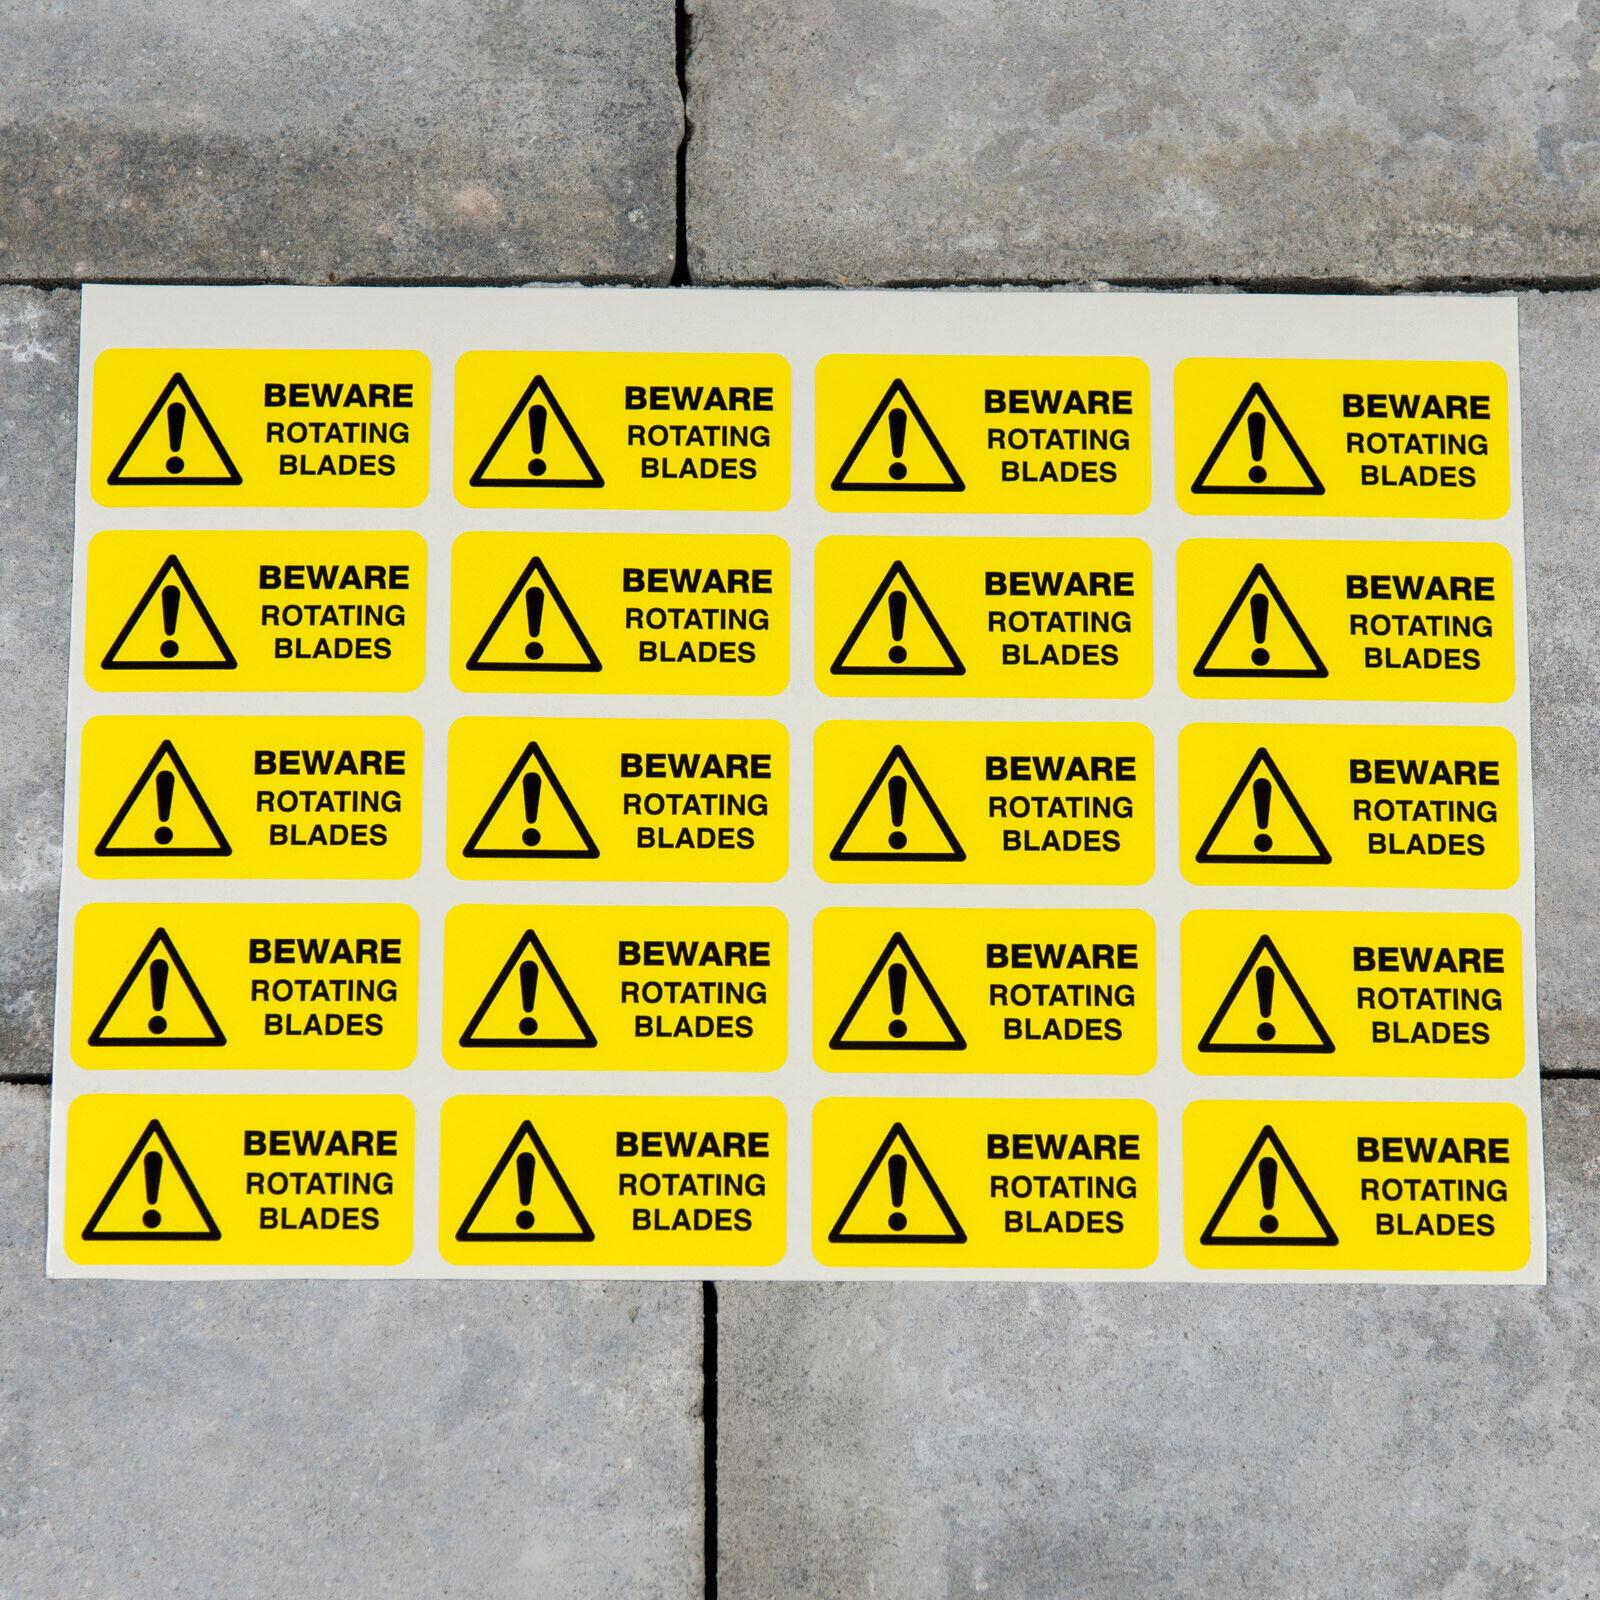 20 x Beware Rotating Blade Industrial Safety Warning Decal Sticker - SKU5919